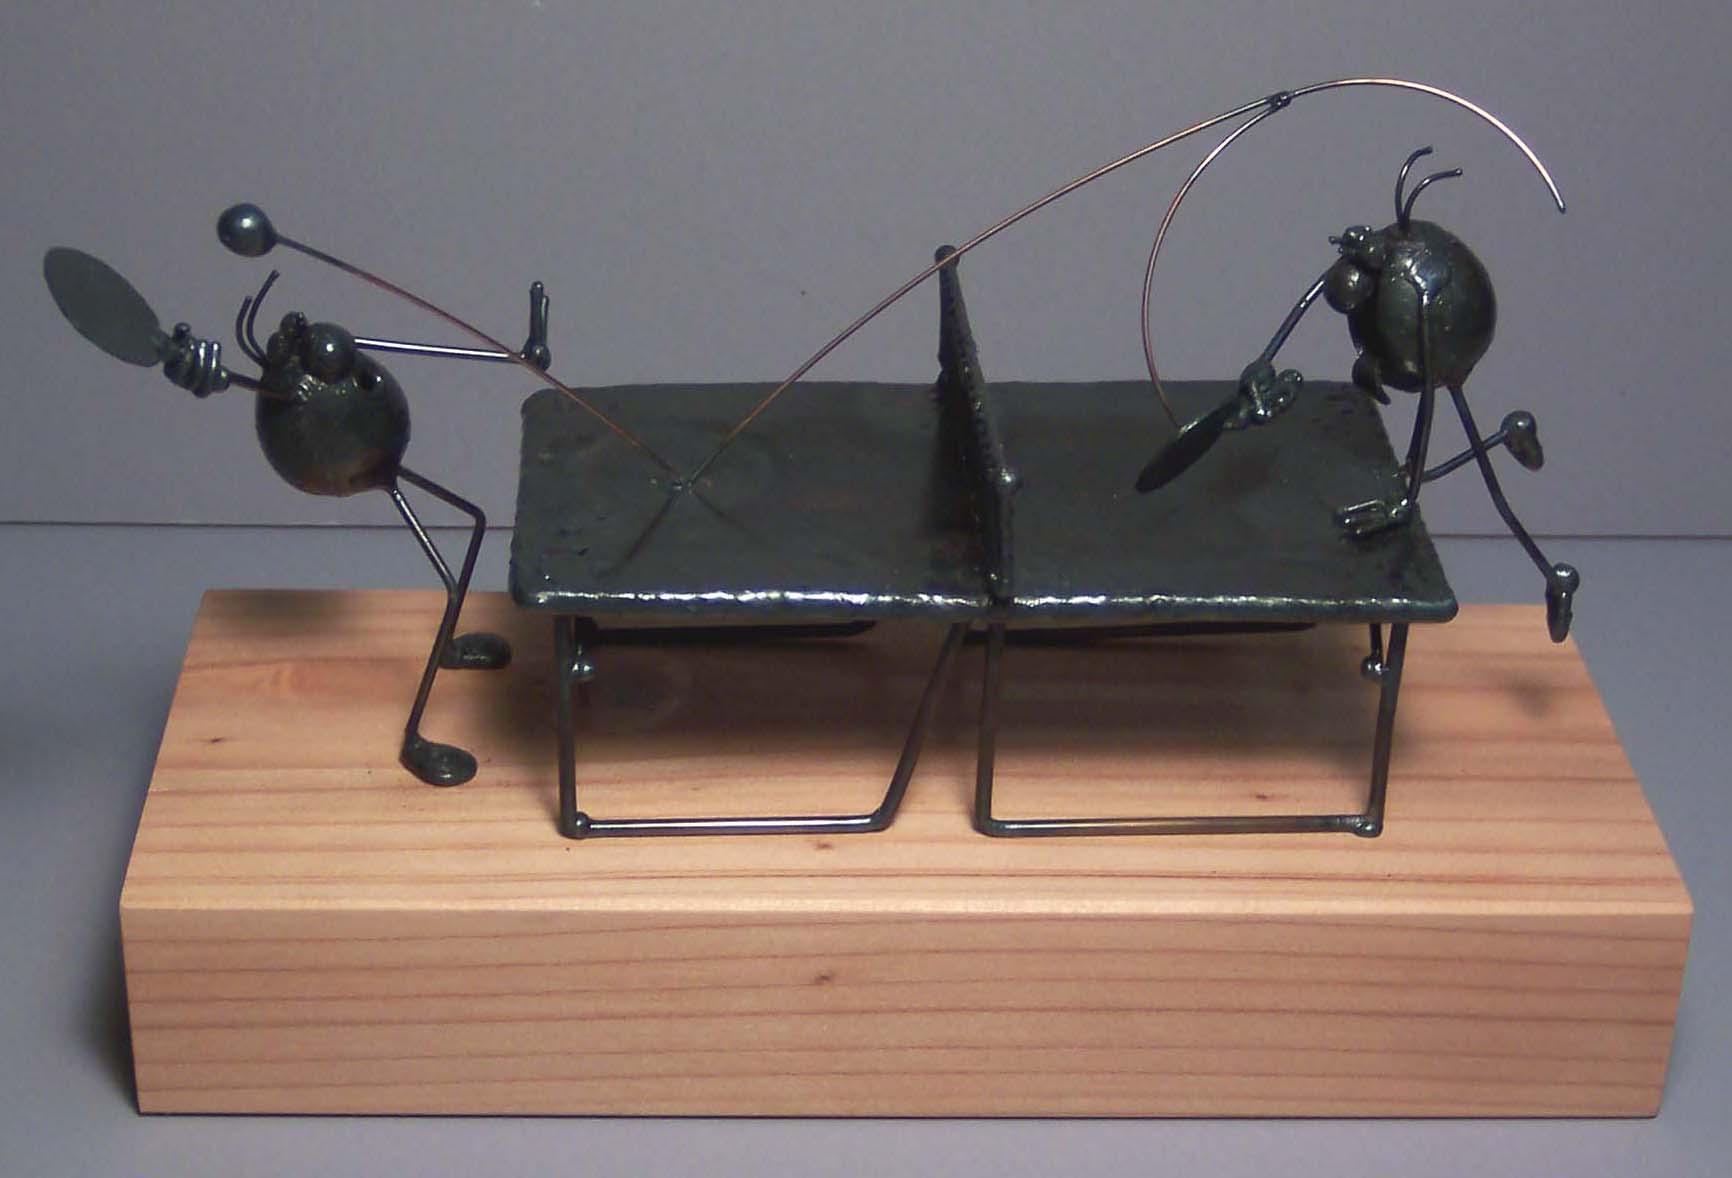 Ping pong scene, 2 flea